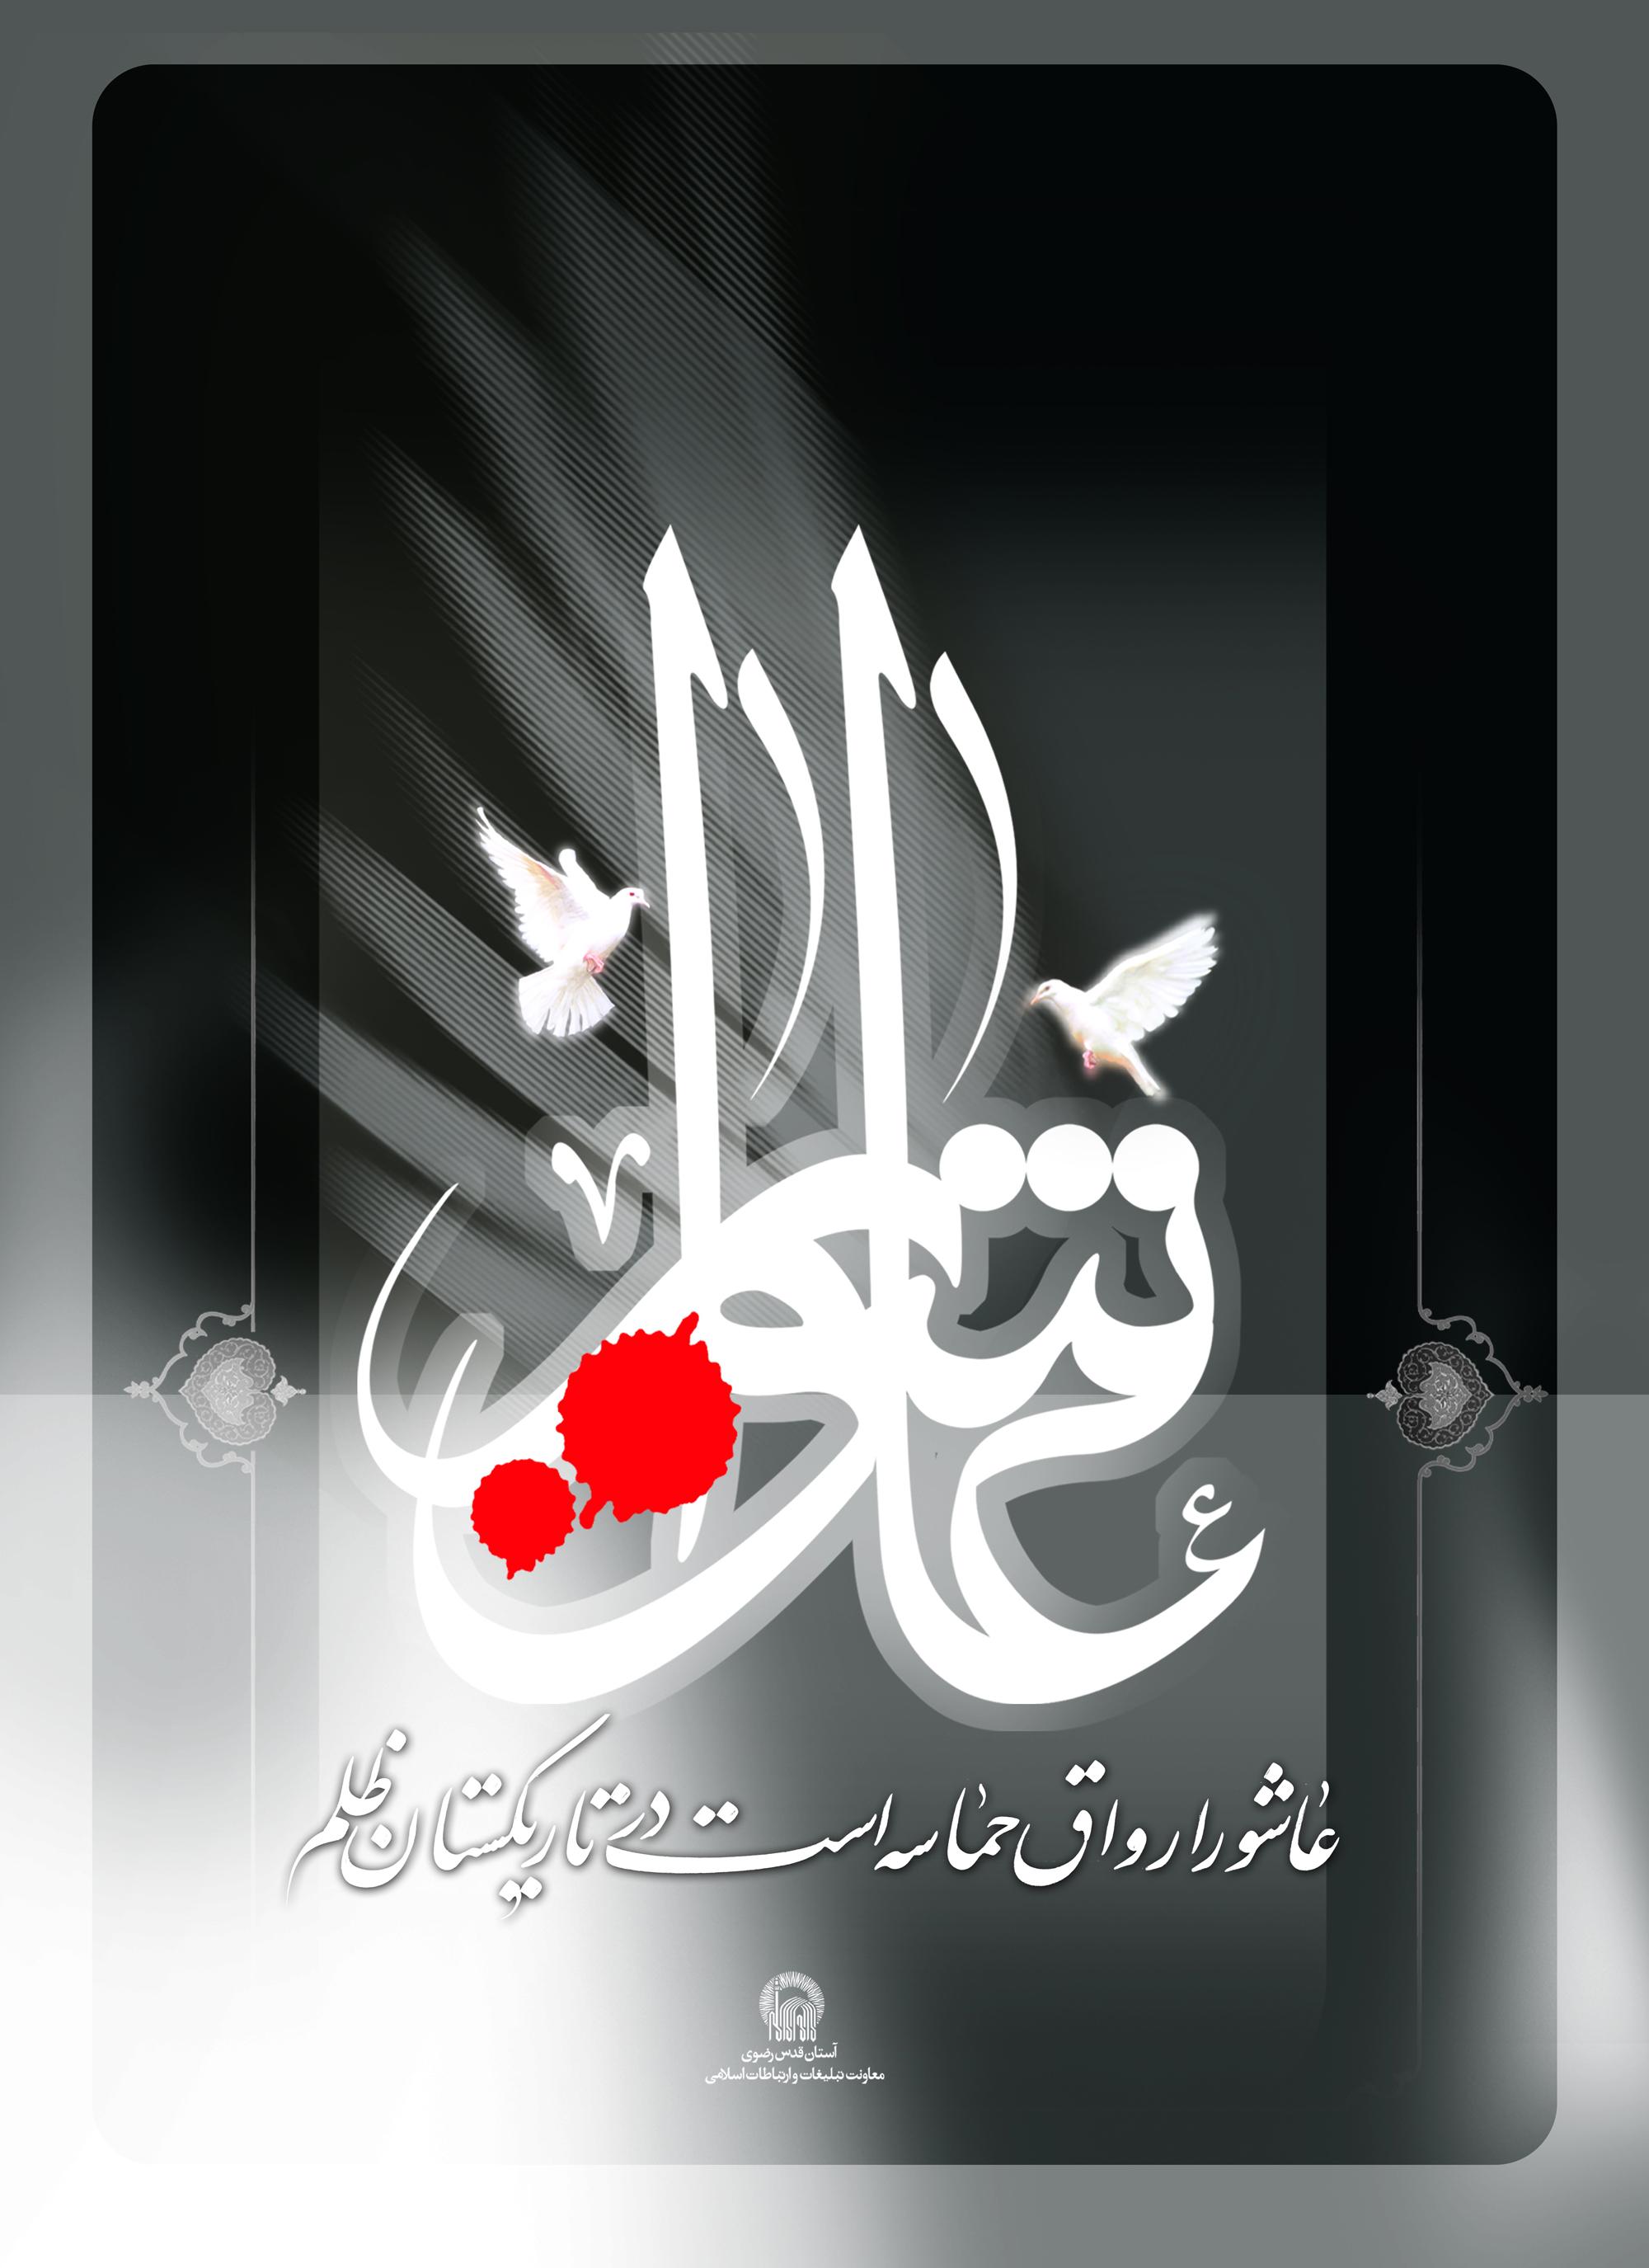 ۰۰۹_ImamHussein_www.IslamicWallpaper